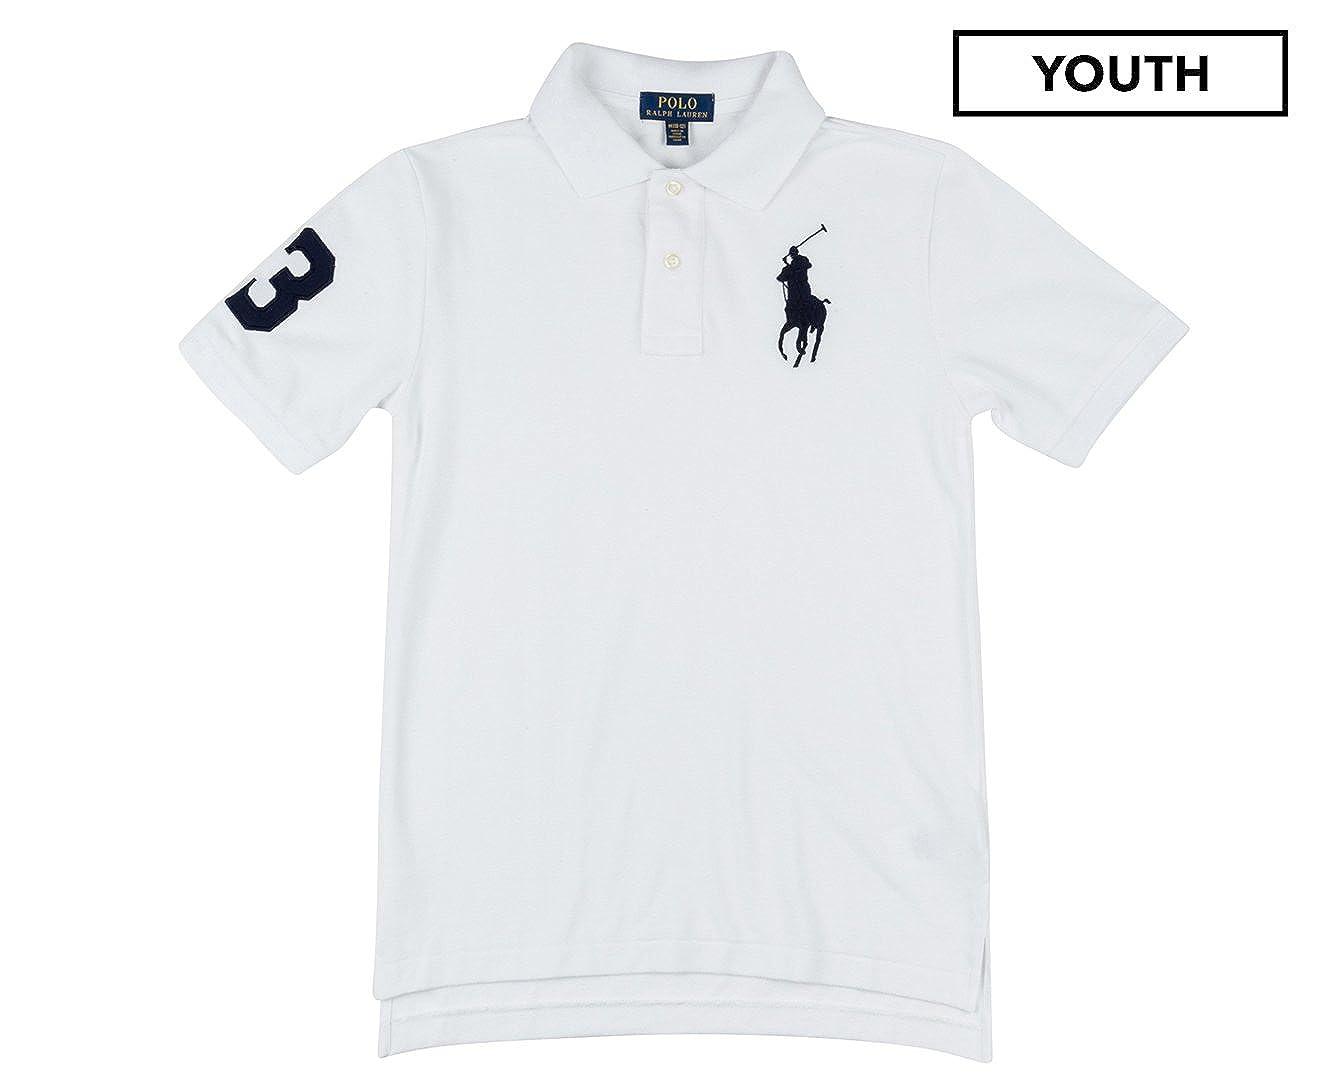 Polo Ralph Lauren Boys (8-20) Big Pony Shirt Long Sleeve Mesh Cotton